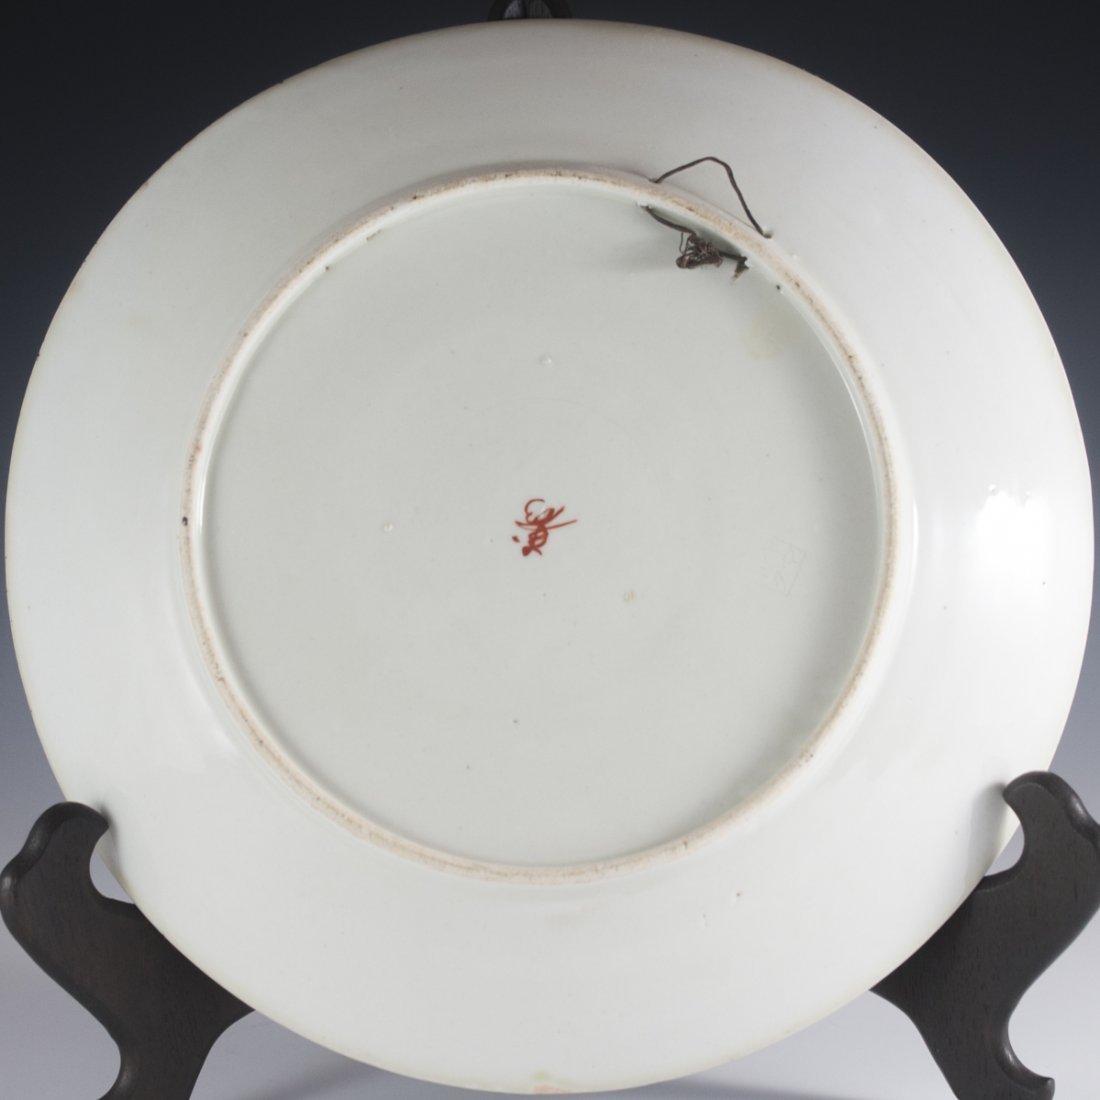 Japanese Famille Noire Porcelain Charger - 3